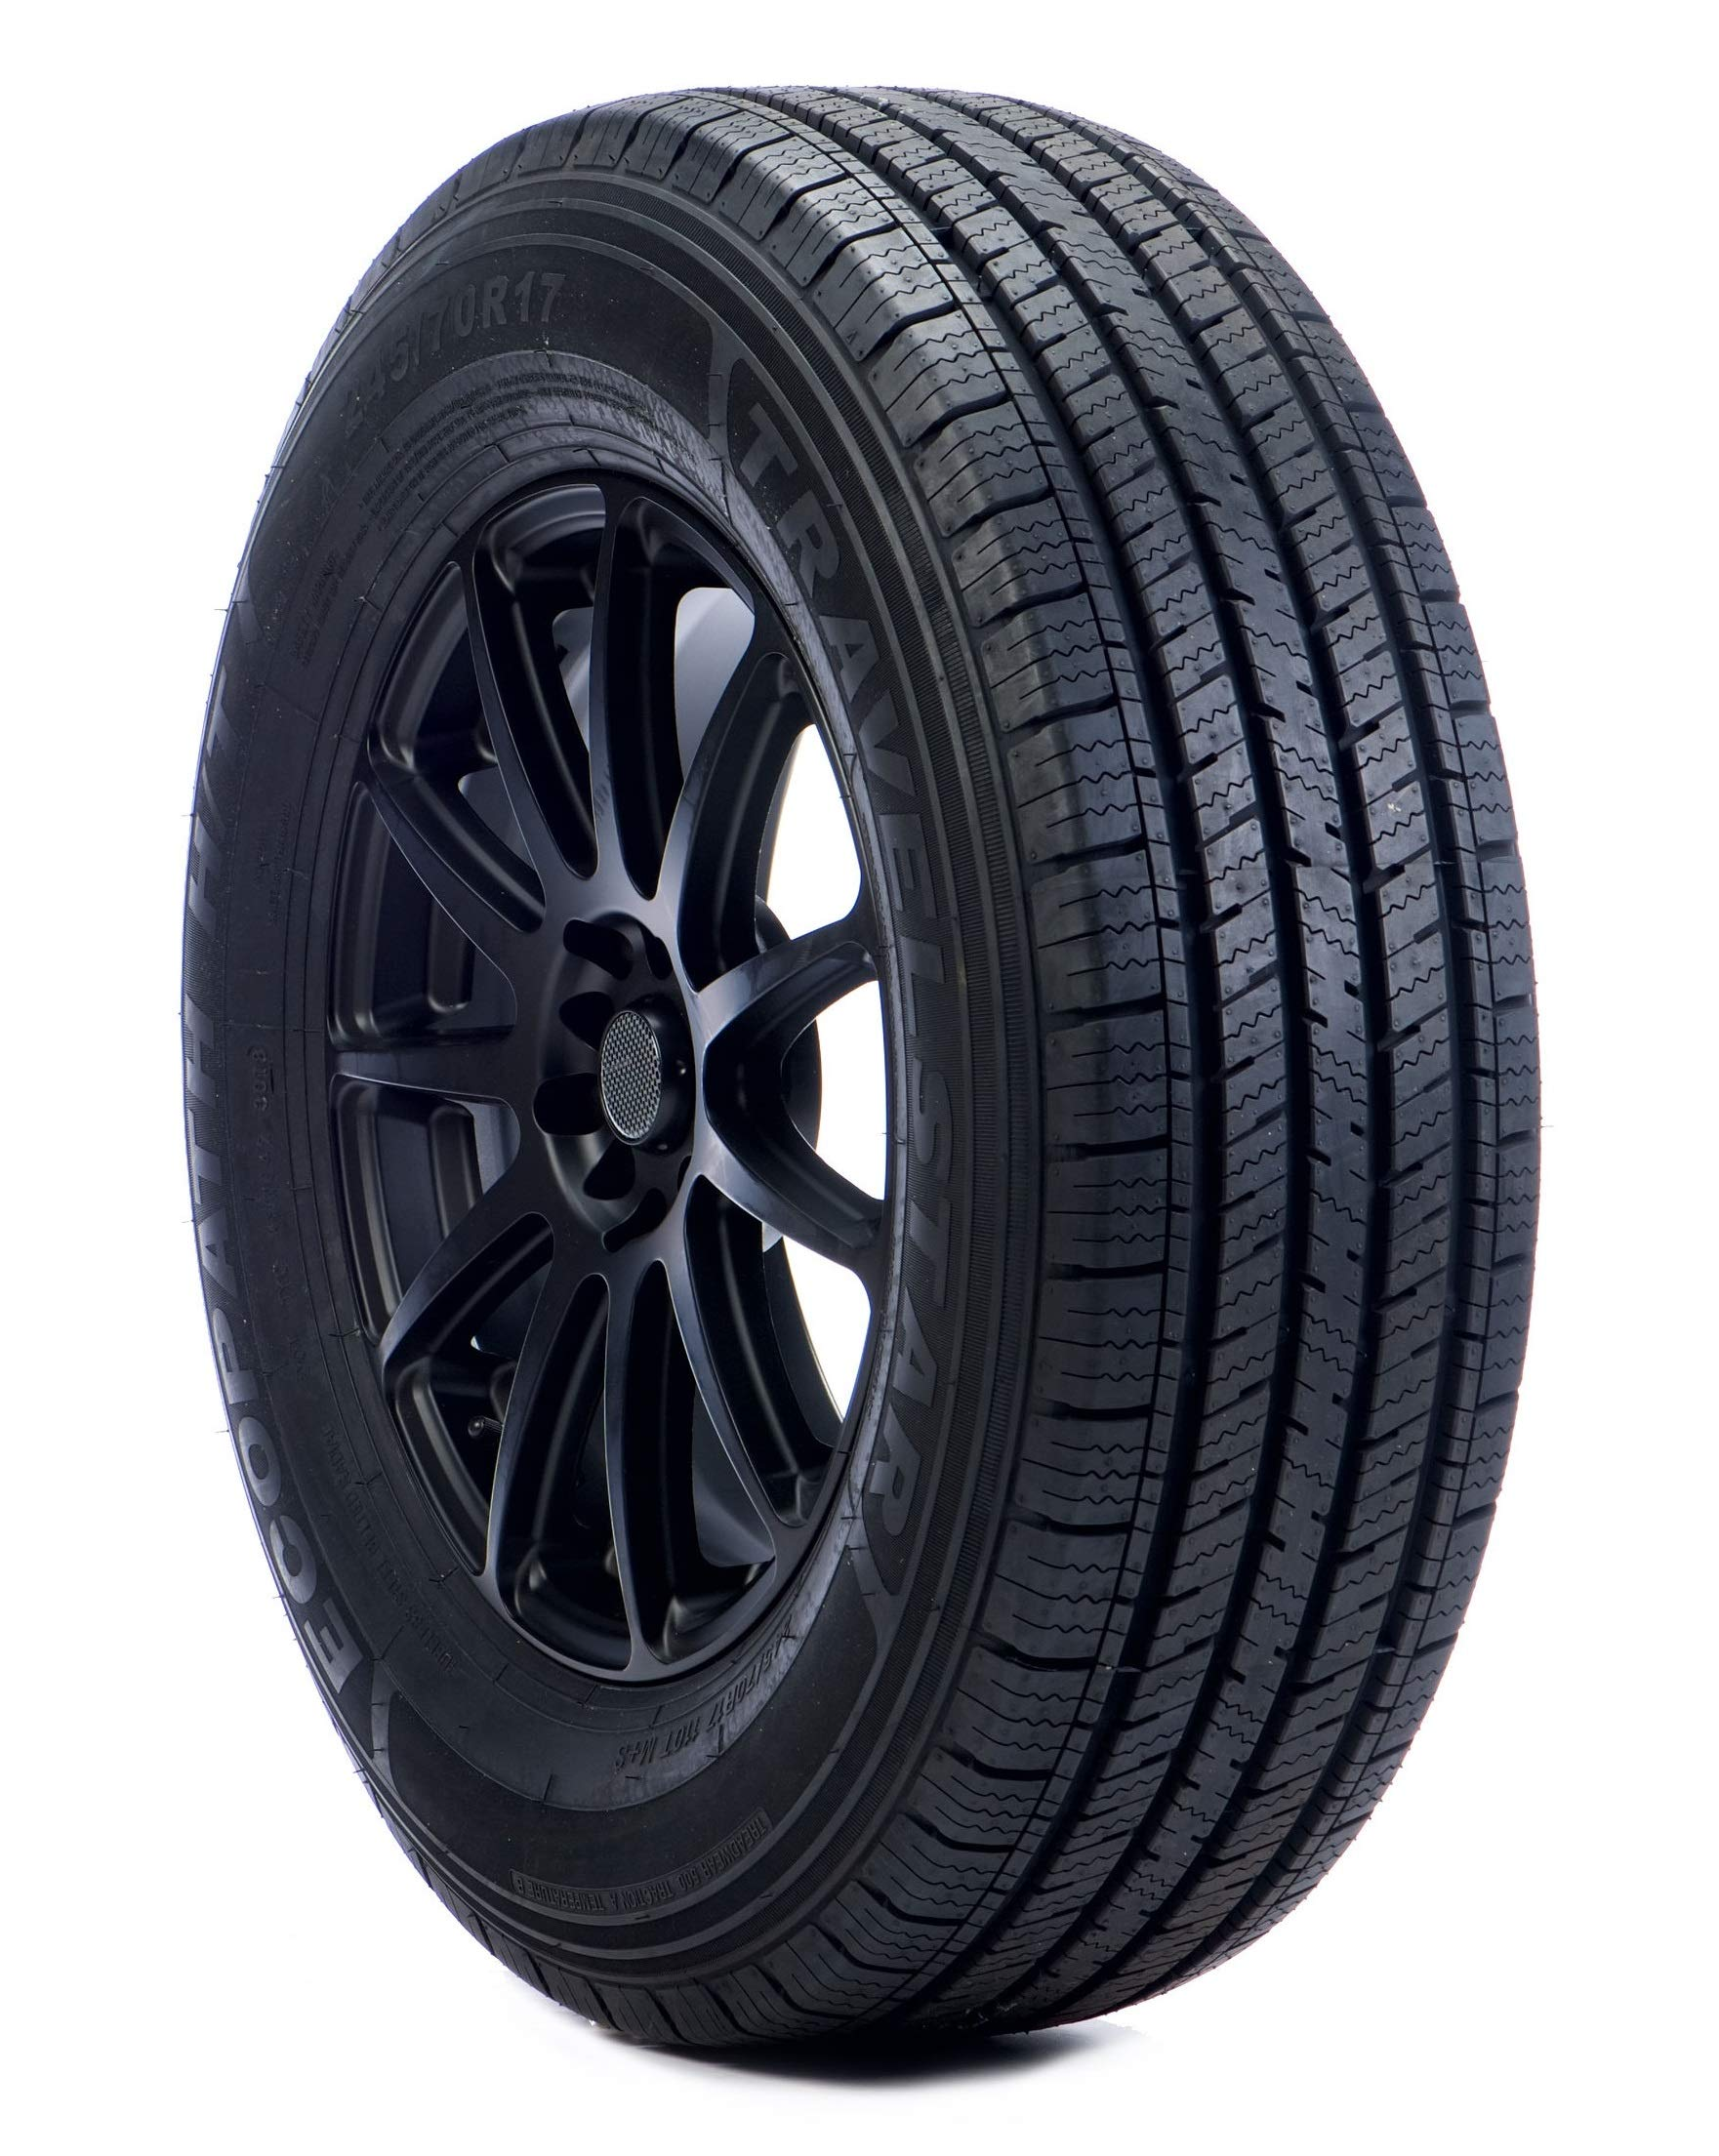 Travelstar EcoPath H/T All- Season Radial Tire-235/70R16 106H